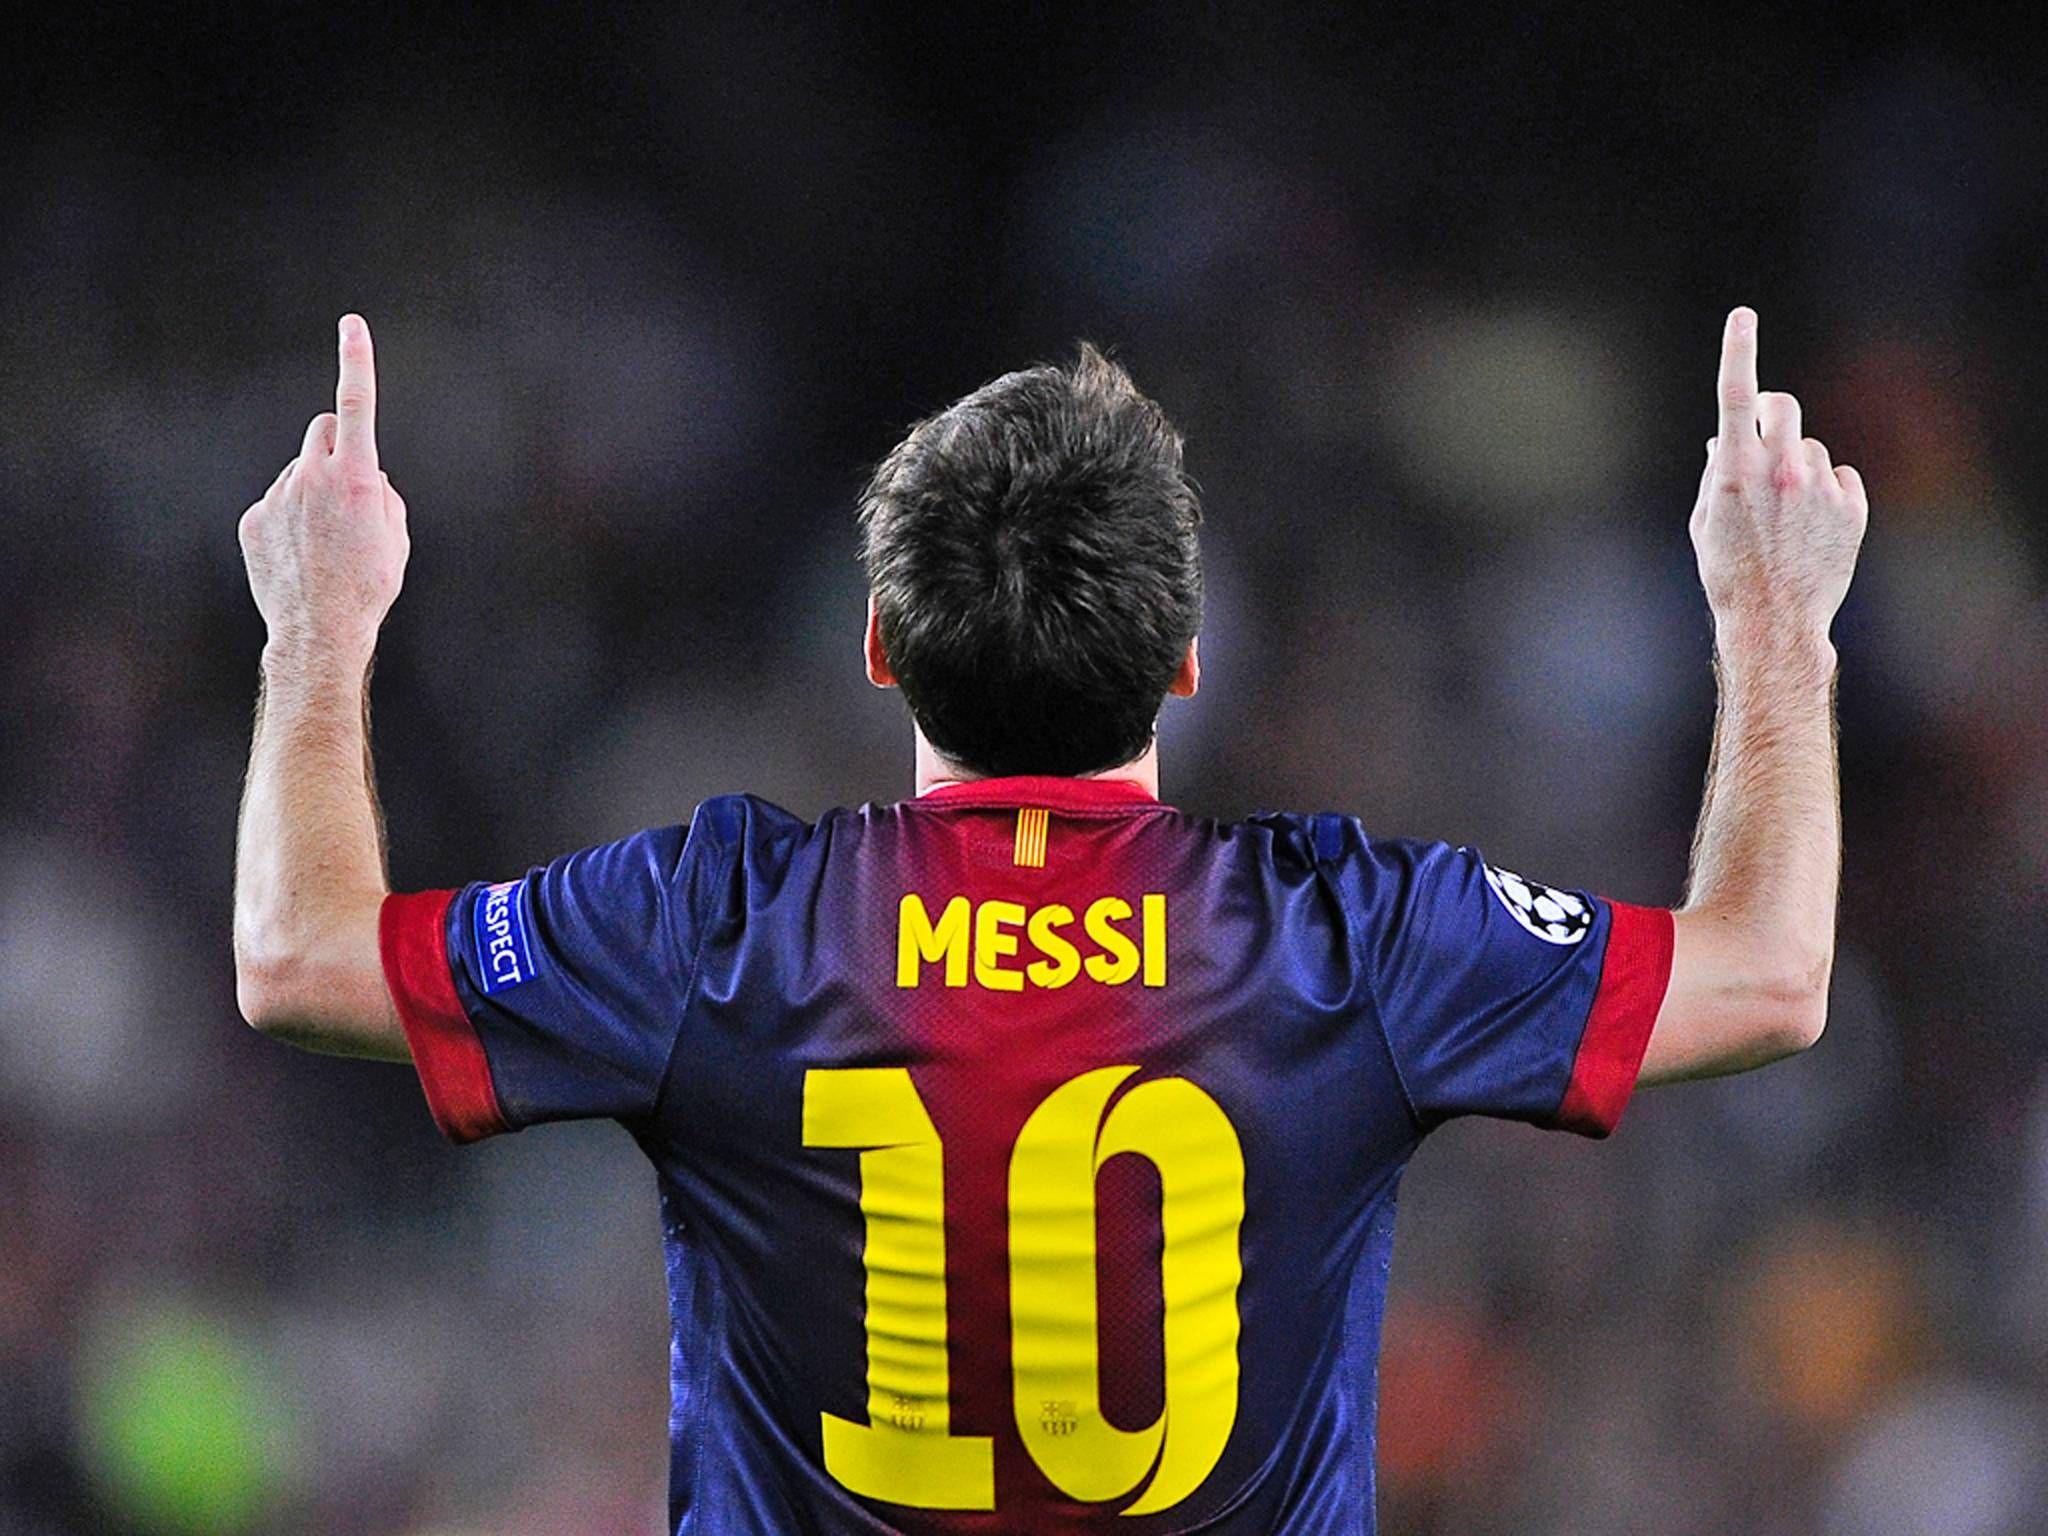 Lionel Messi Wallpaper Lionel Messi 10 Celebration Wallpapers 123 Wallpaper Wallhud Com